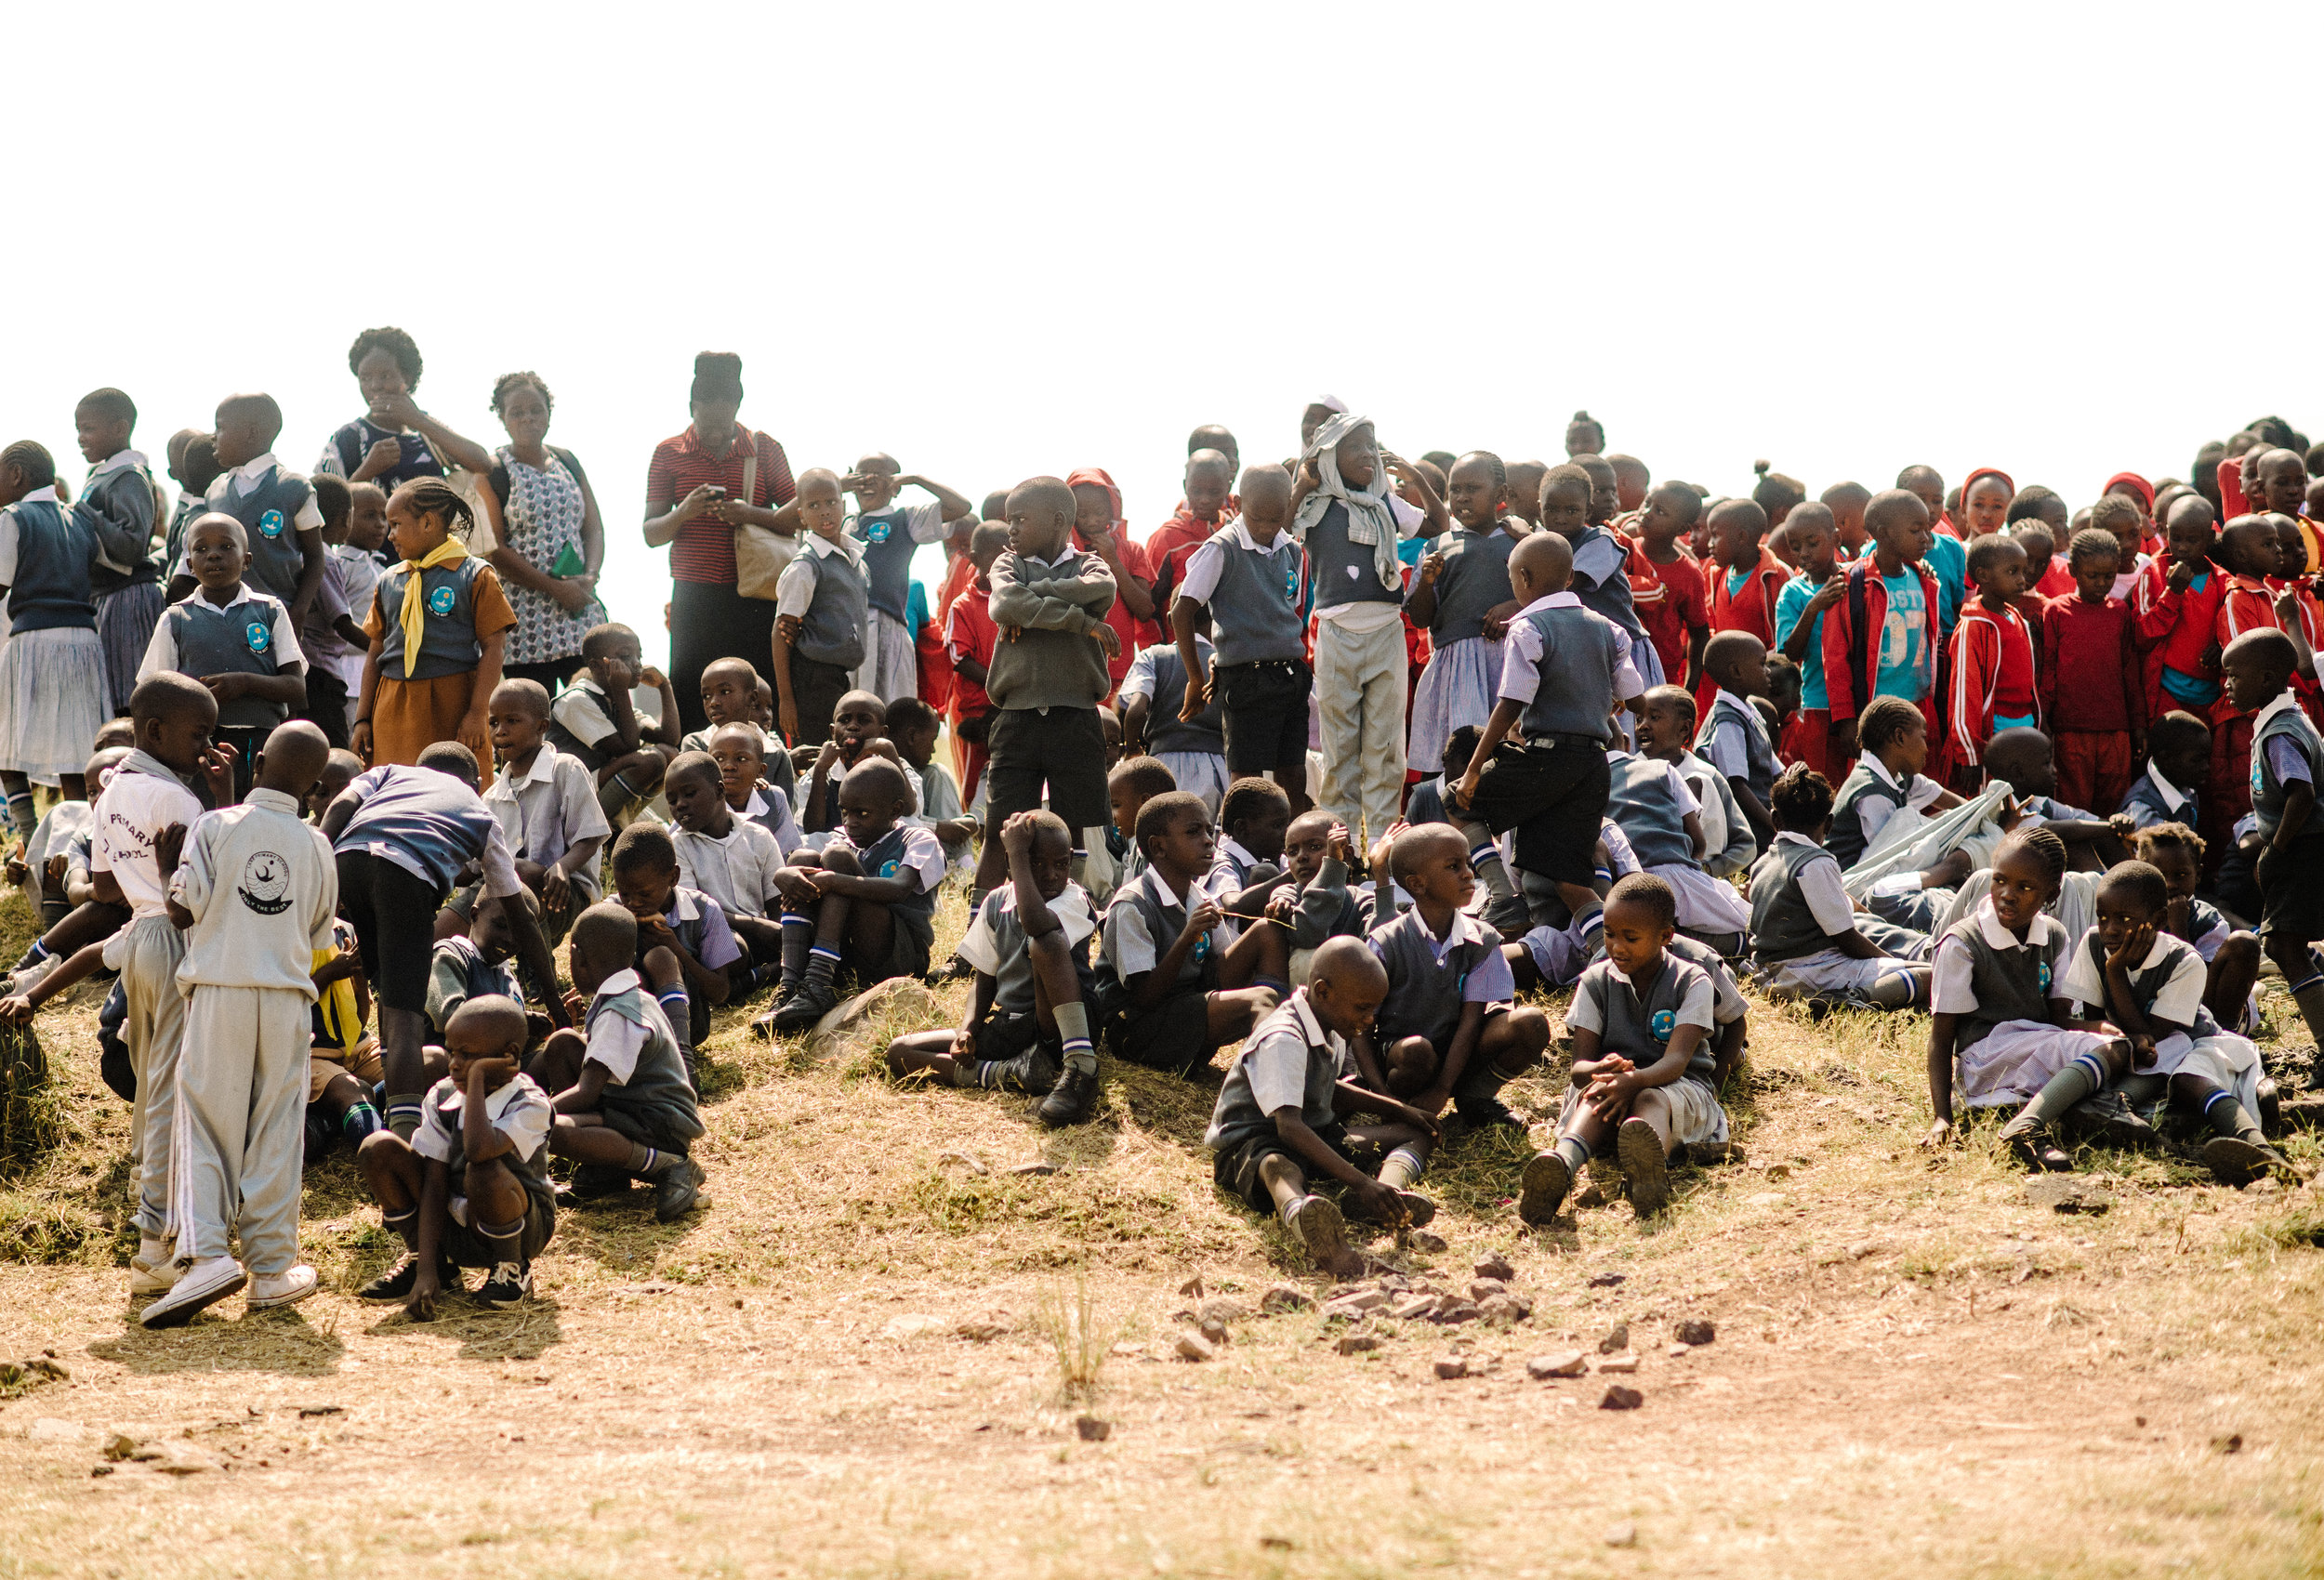 Dapper-Lou-Kenya-Giants-of-Africa-4.jpg